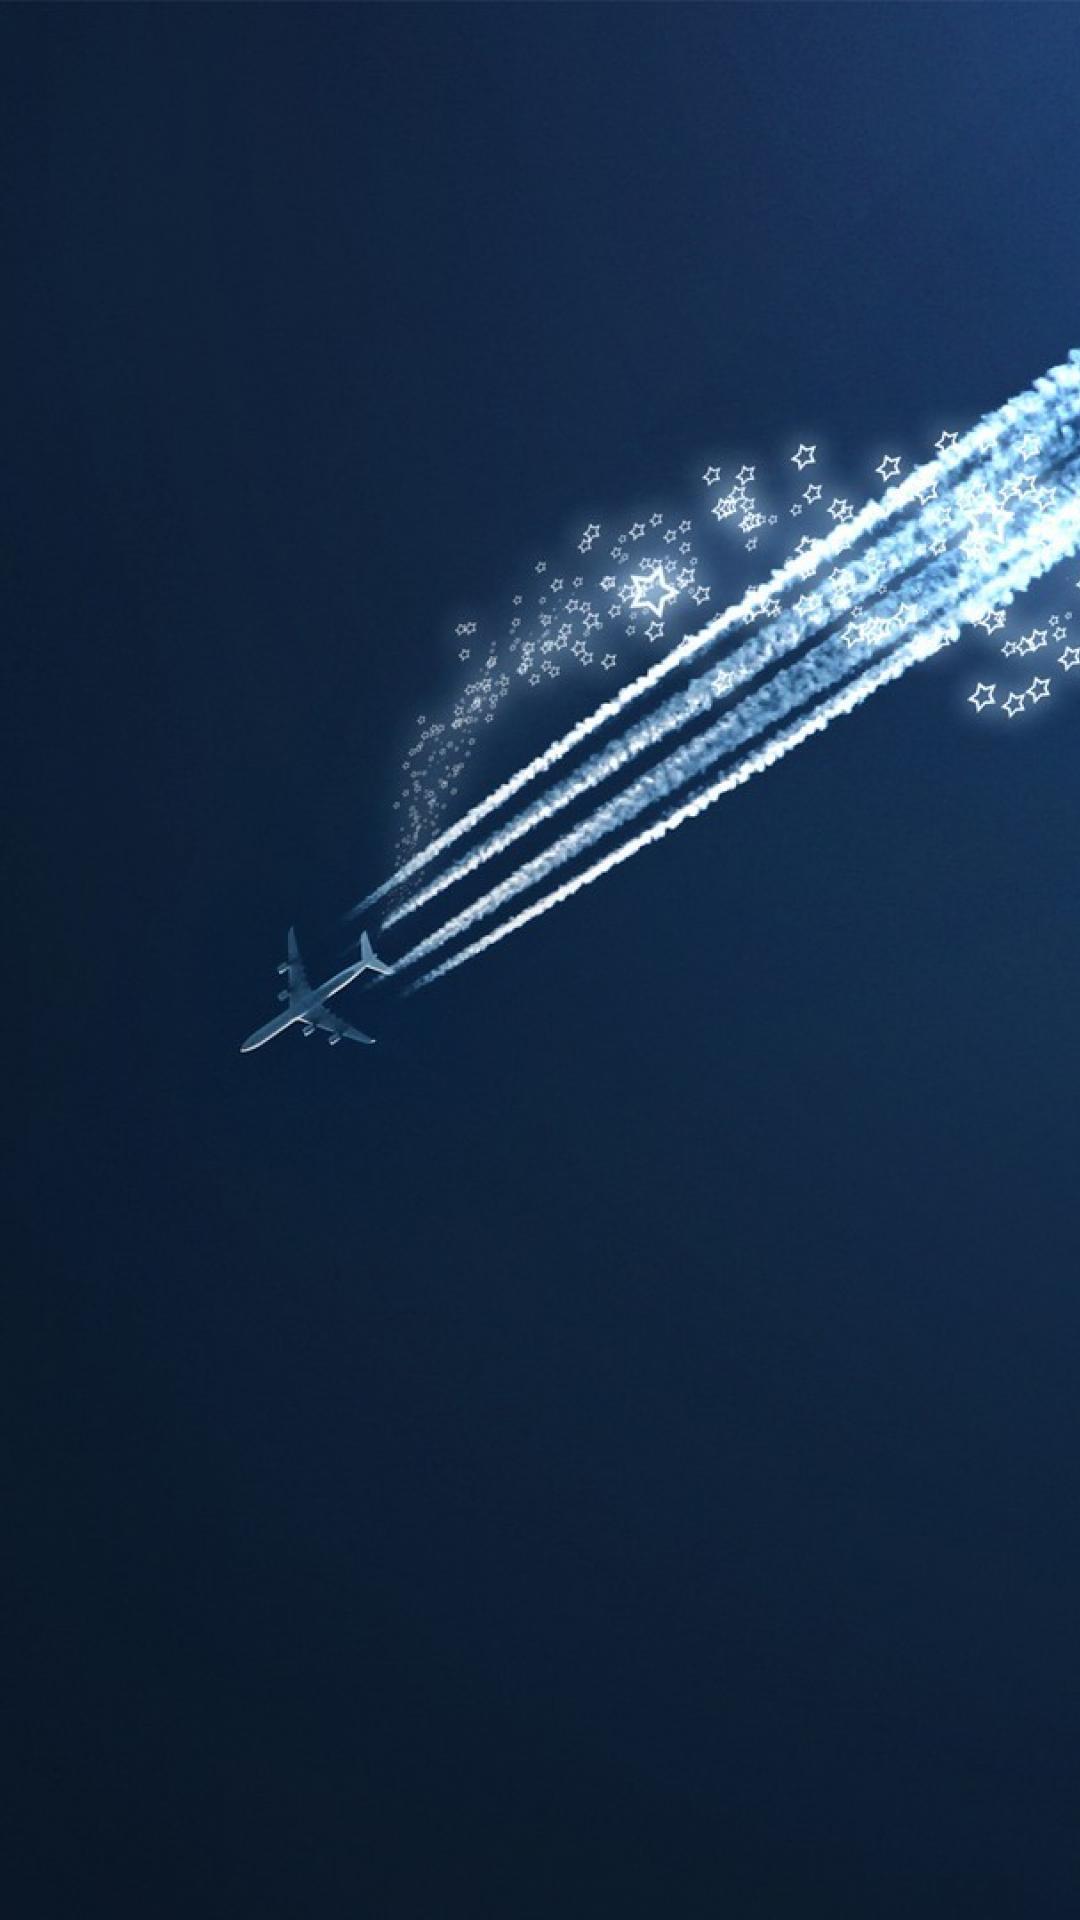 Aircraft shooting star blue background wallpaper 14789 1080x1920